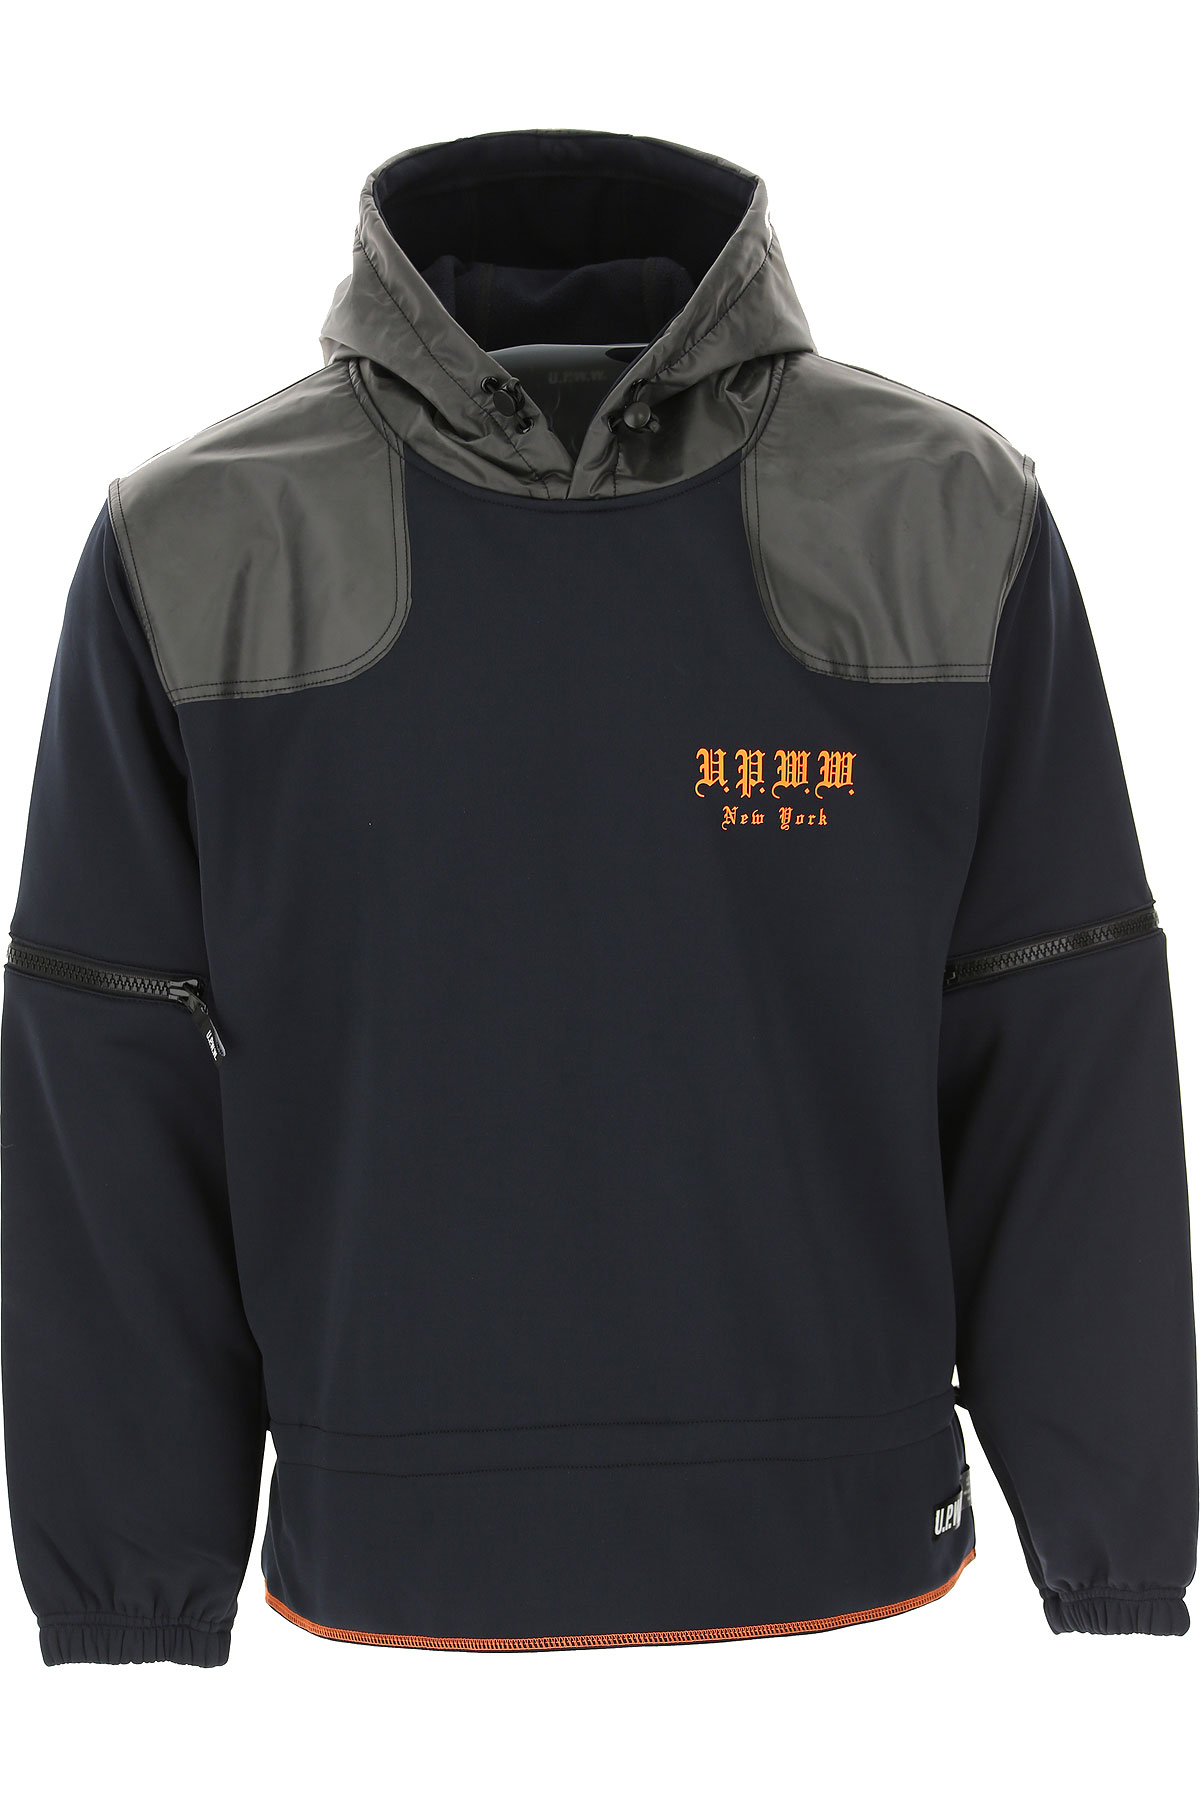 U.P.W.W. Sweatshirt for Men, Blue, polyester, 2019, L M S